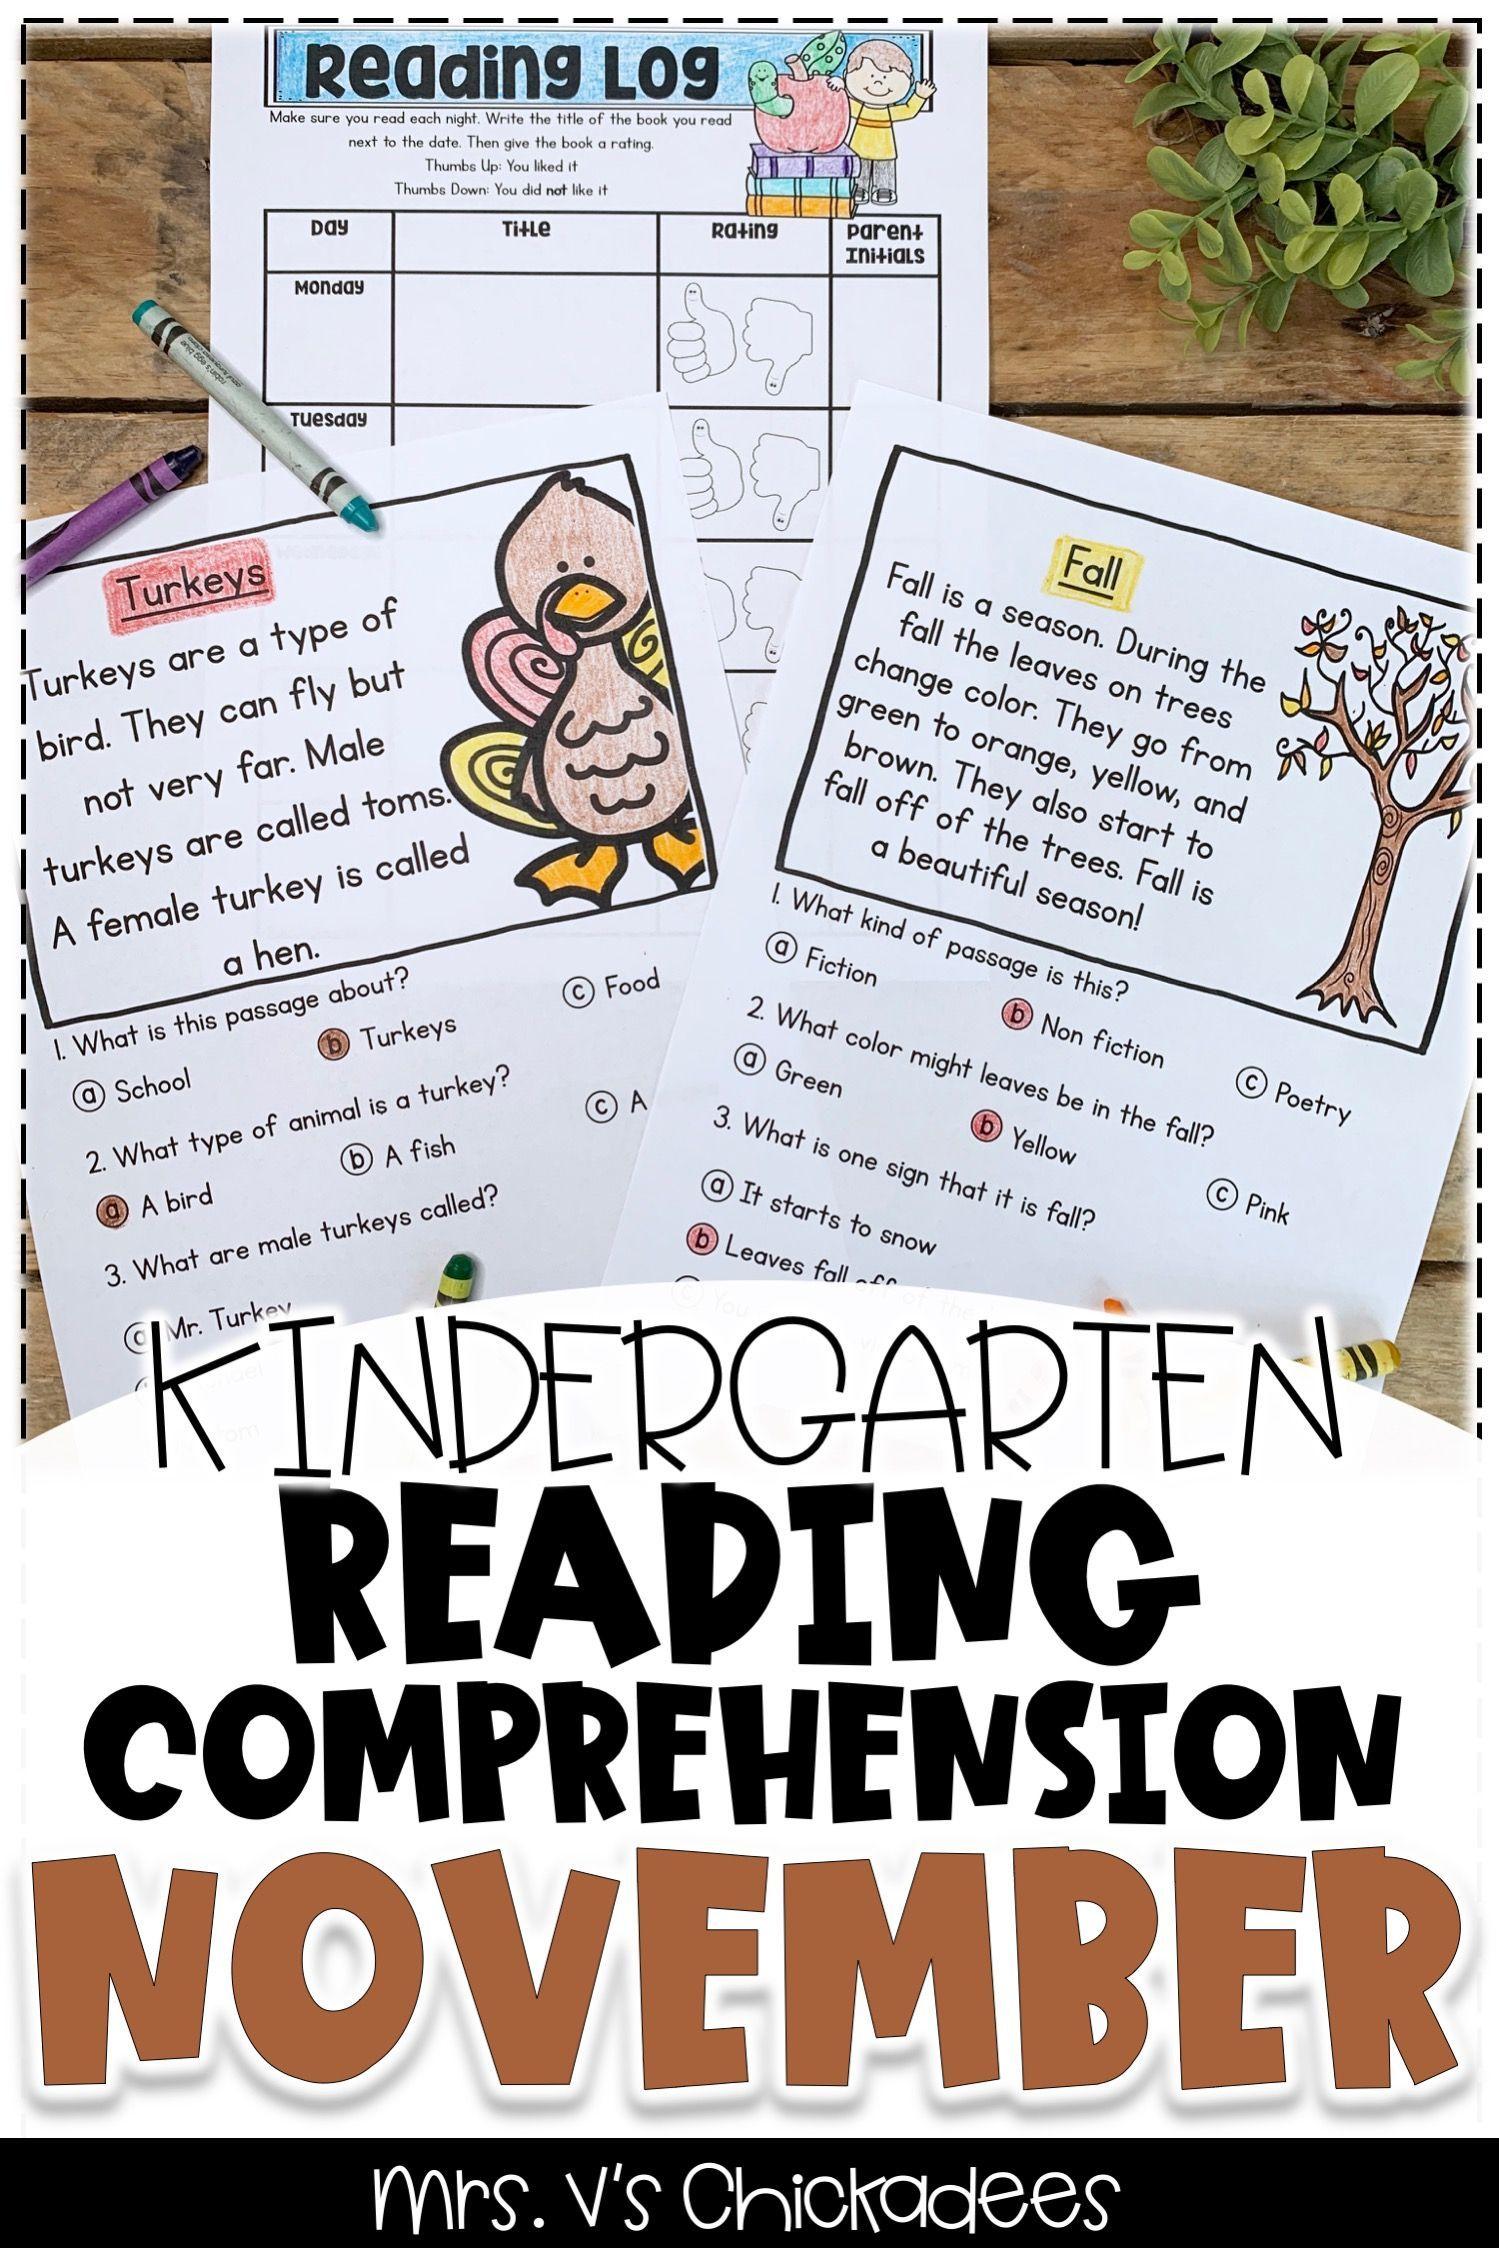 These Kindergarten Reading Comprehension Activities And Worksheets Are Kindergarten Reading Activities Reading Comprehension Kindergarten Reading Comprehension [ 2249 x 1499 Pixel ]